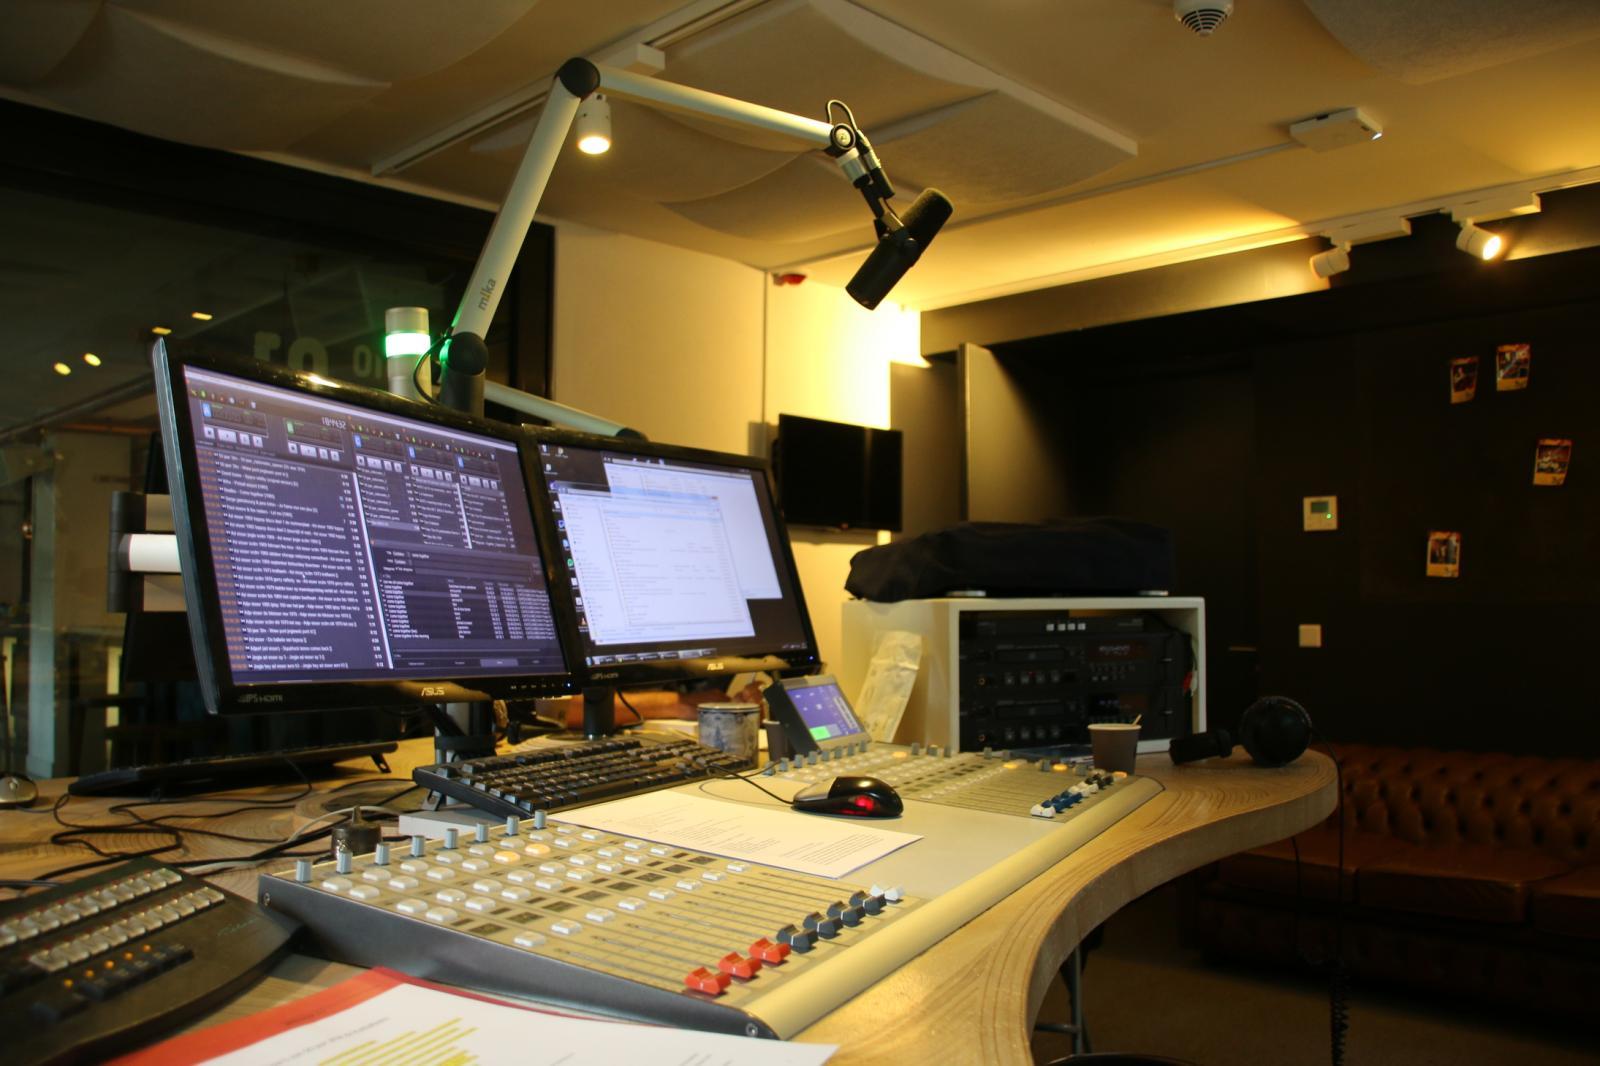 KX Radio - 26-08-2015 - 50 jaar 3FM met Ad Visser